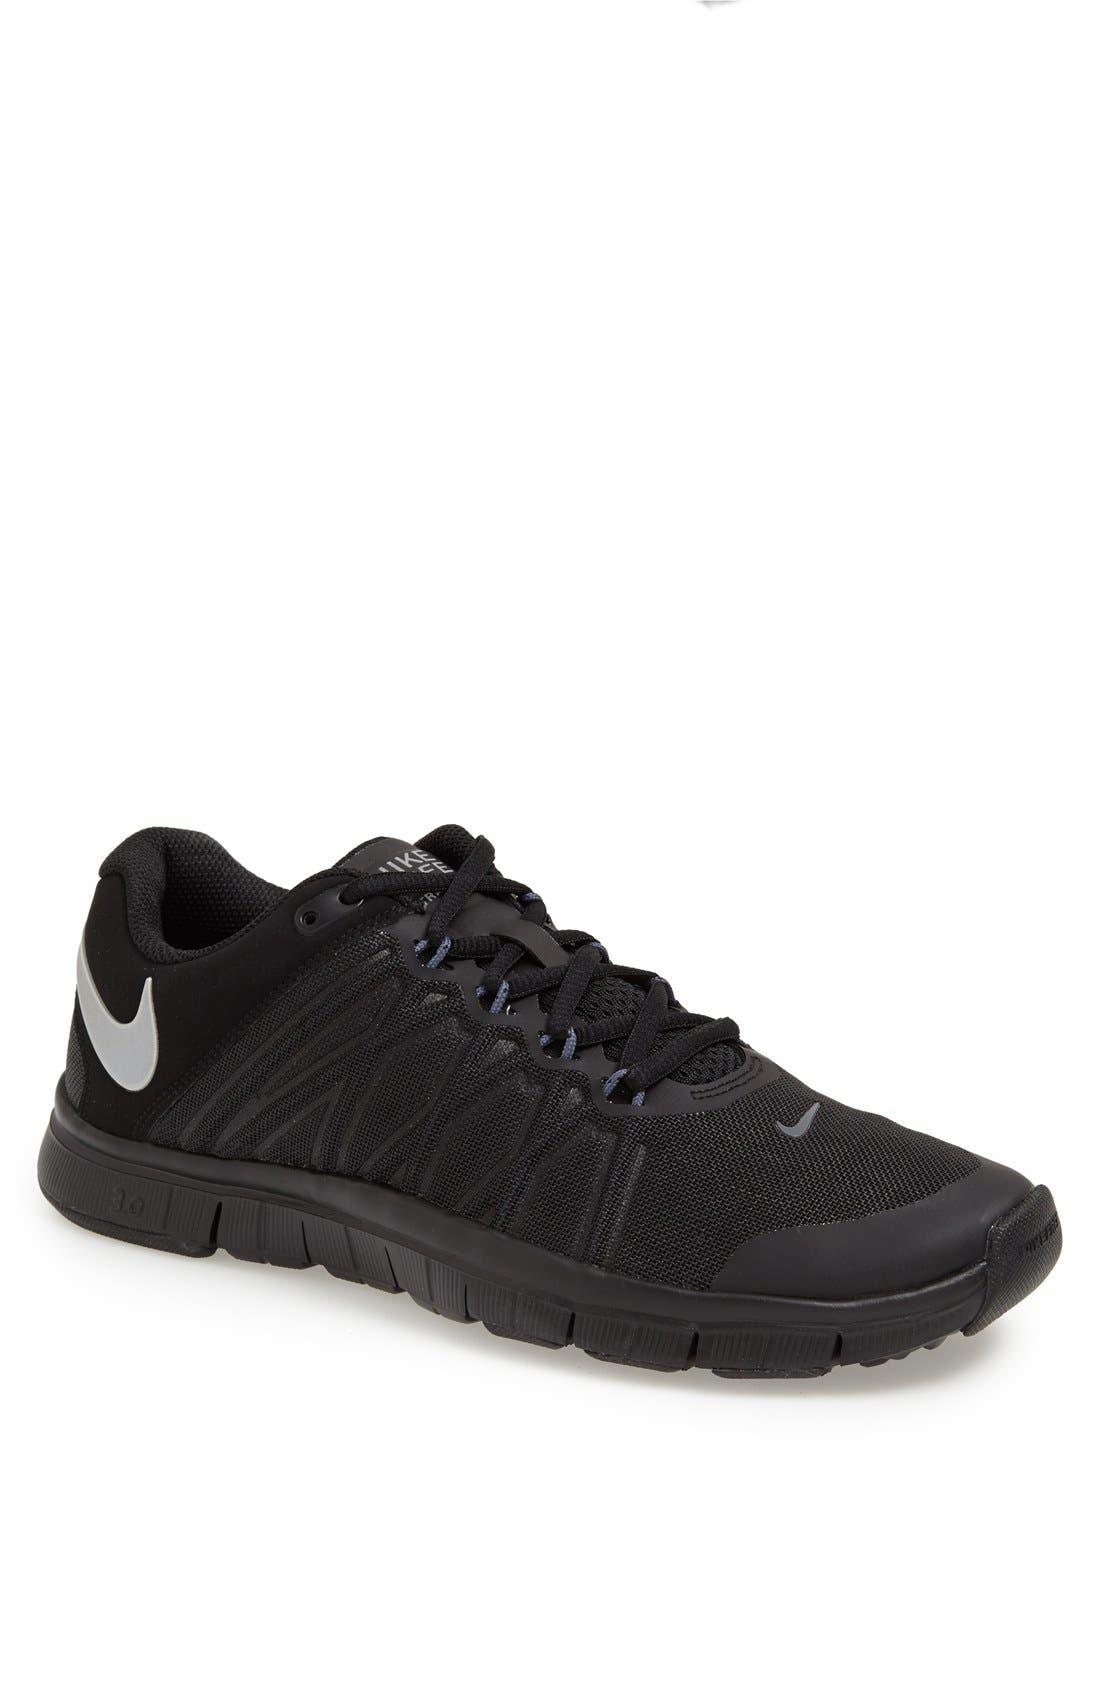 Nike Free Trainer 3.0 Carte Nordstrom